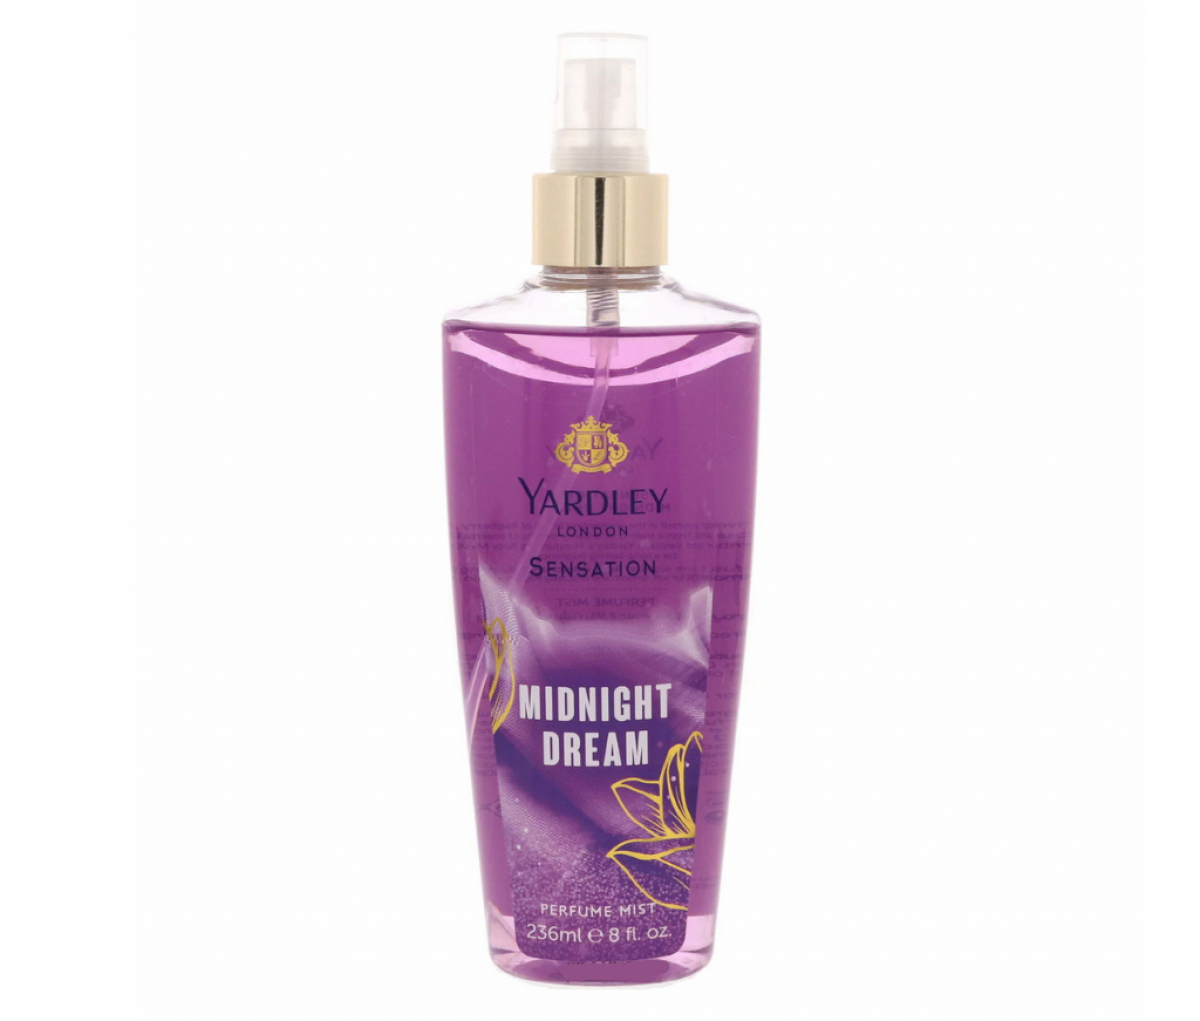 Yardley Body Mist 236ml Midnight Dream